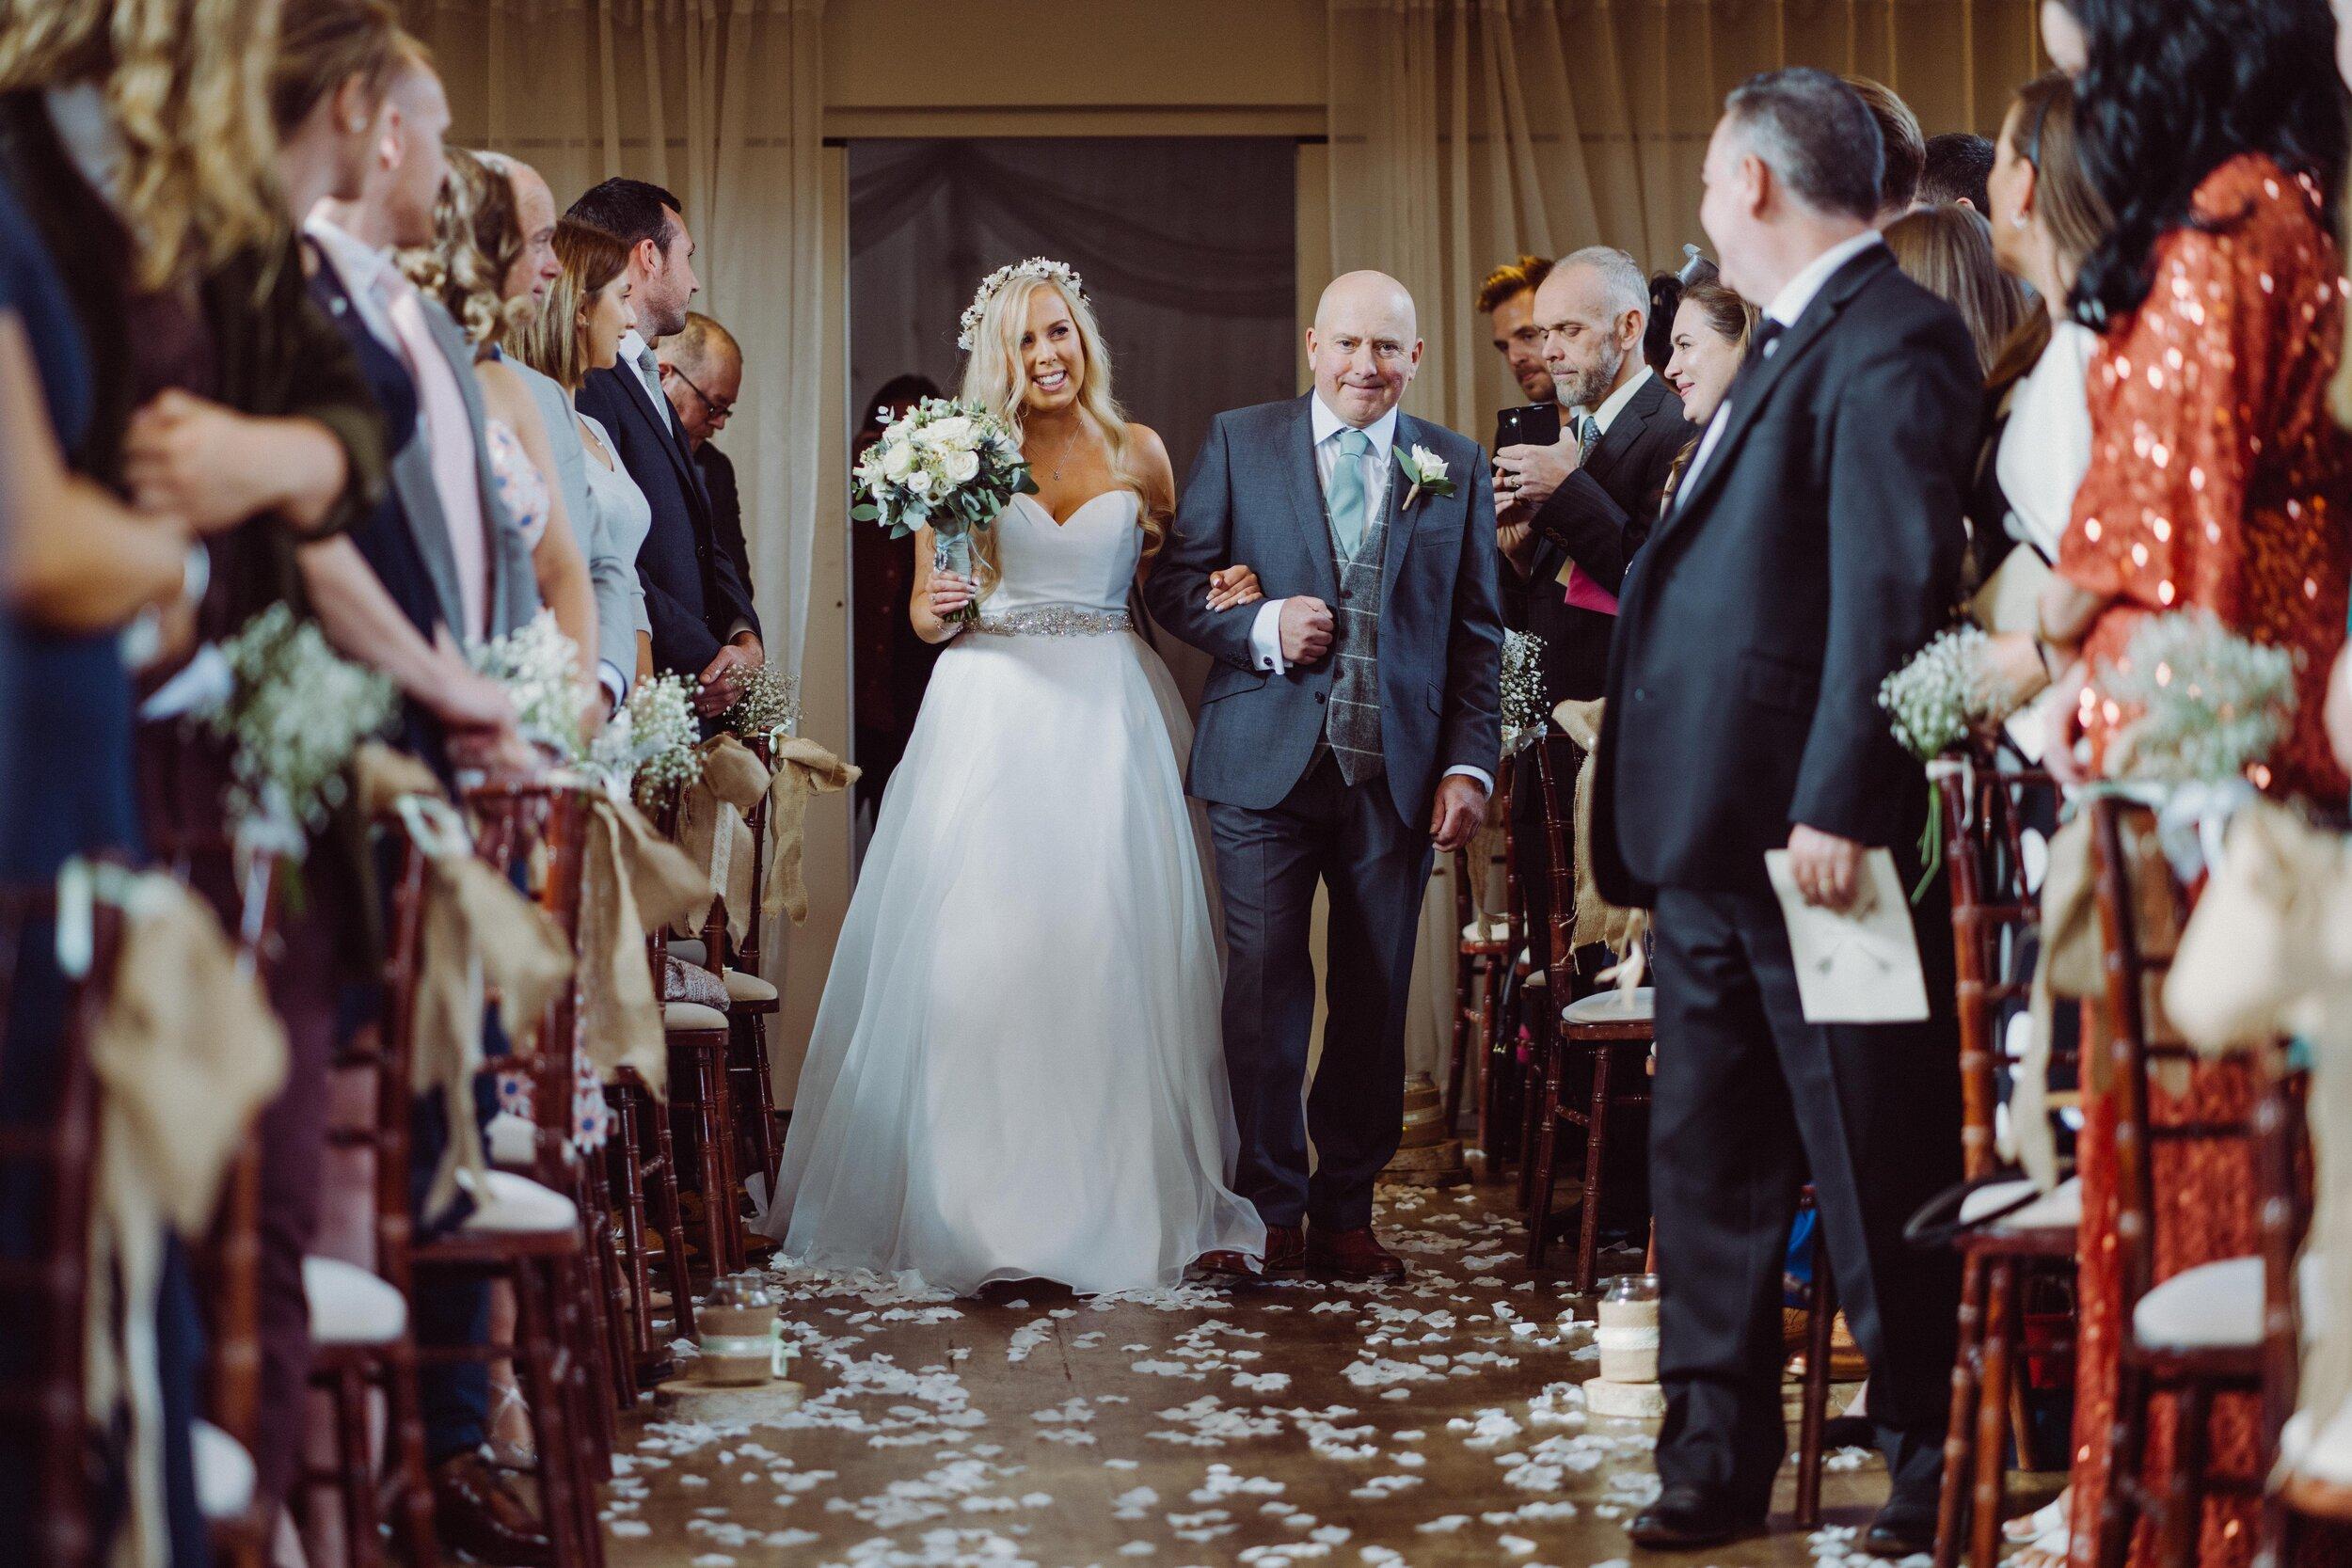 kent-wedding-photographer-101588.jpg